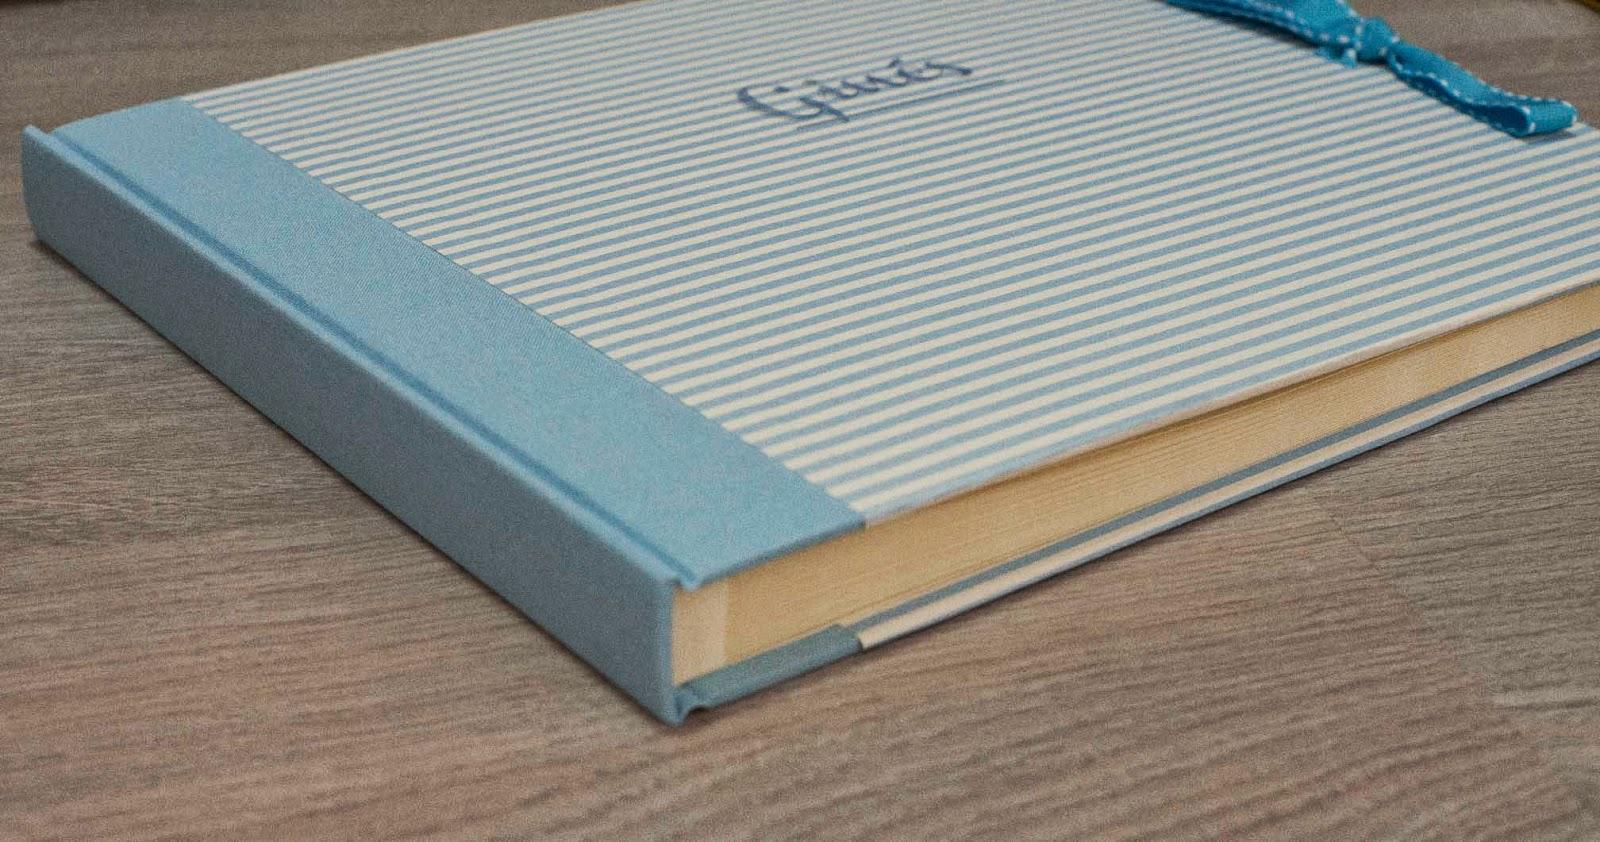 encuadernacion bookbinding